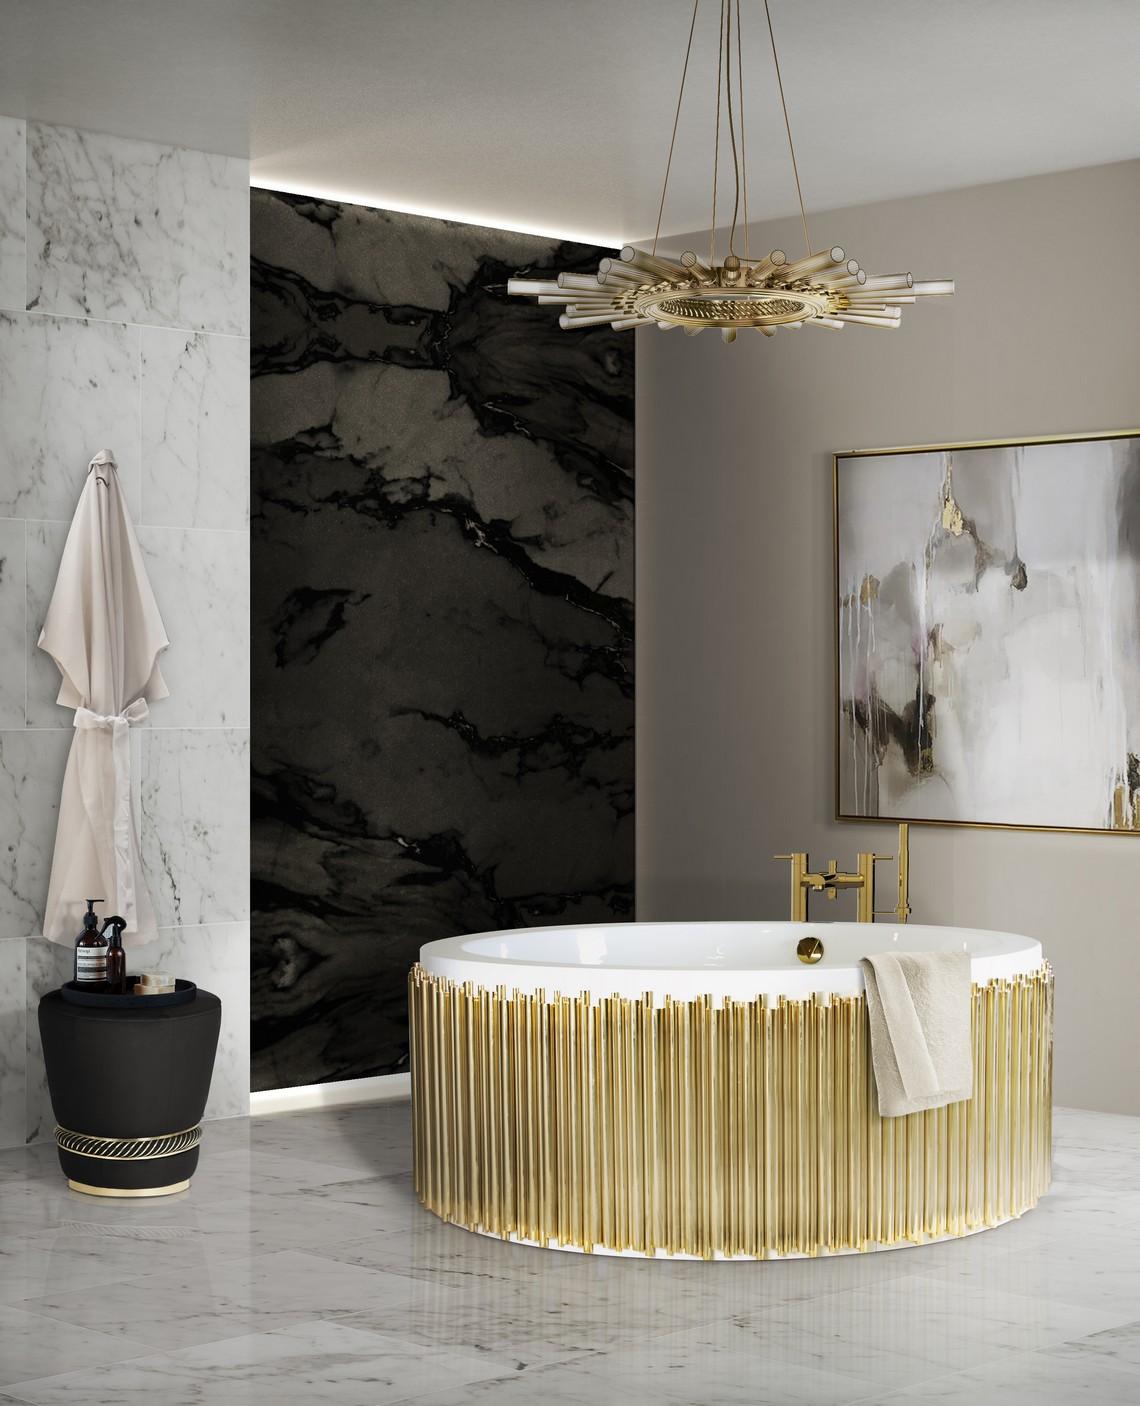 Top 5 Modern Bathtubs by Maison Valentina modern bathtubs Top 5 Modern Bathtubs by Maison Valentina 27 symphony bathtub black paramount surface HR